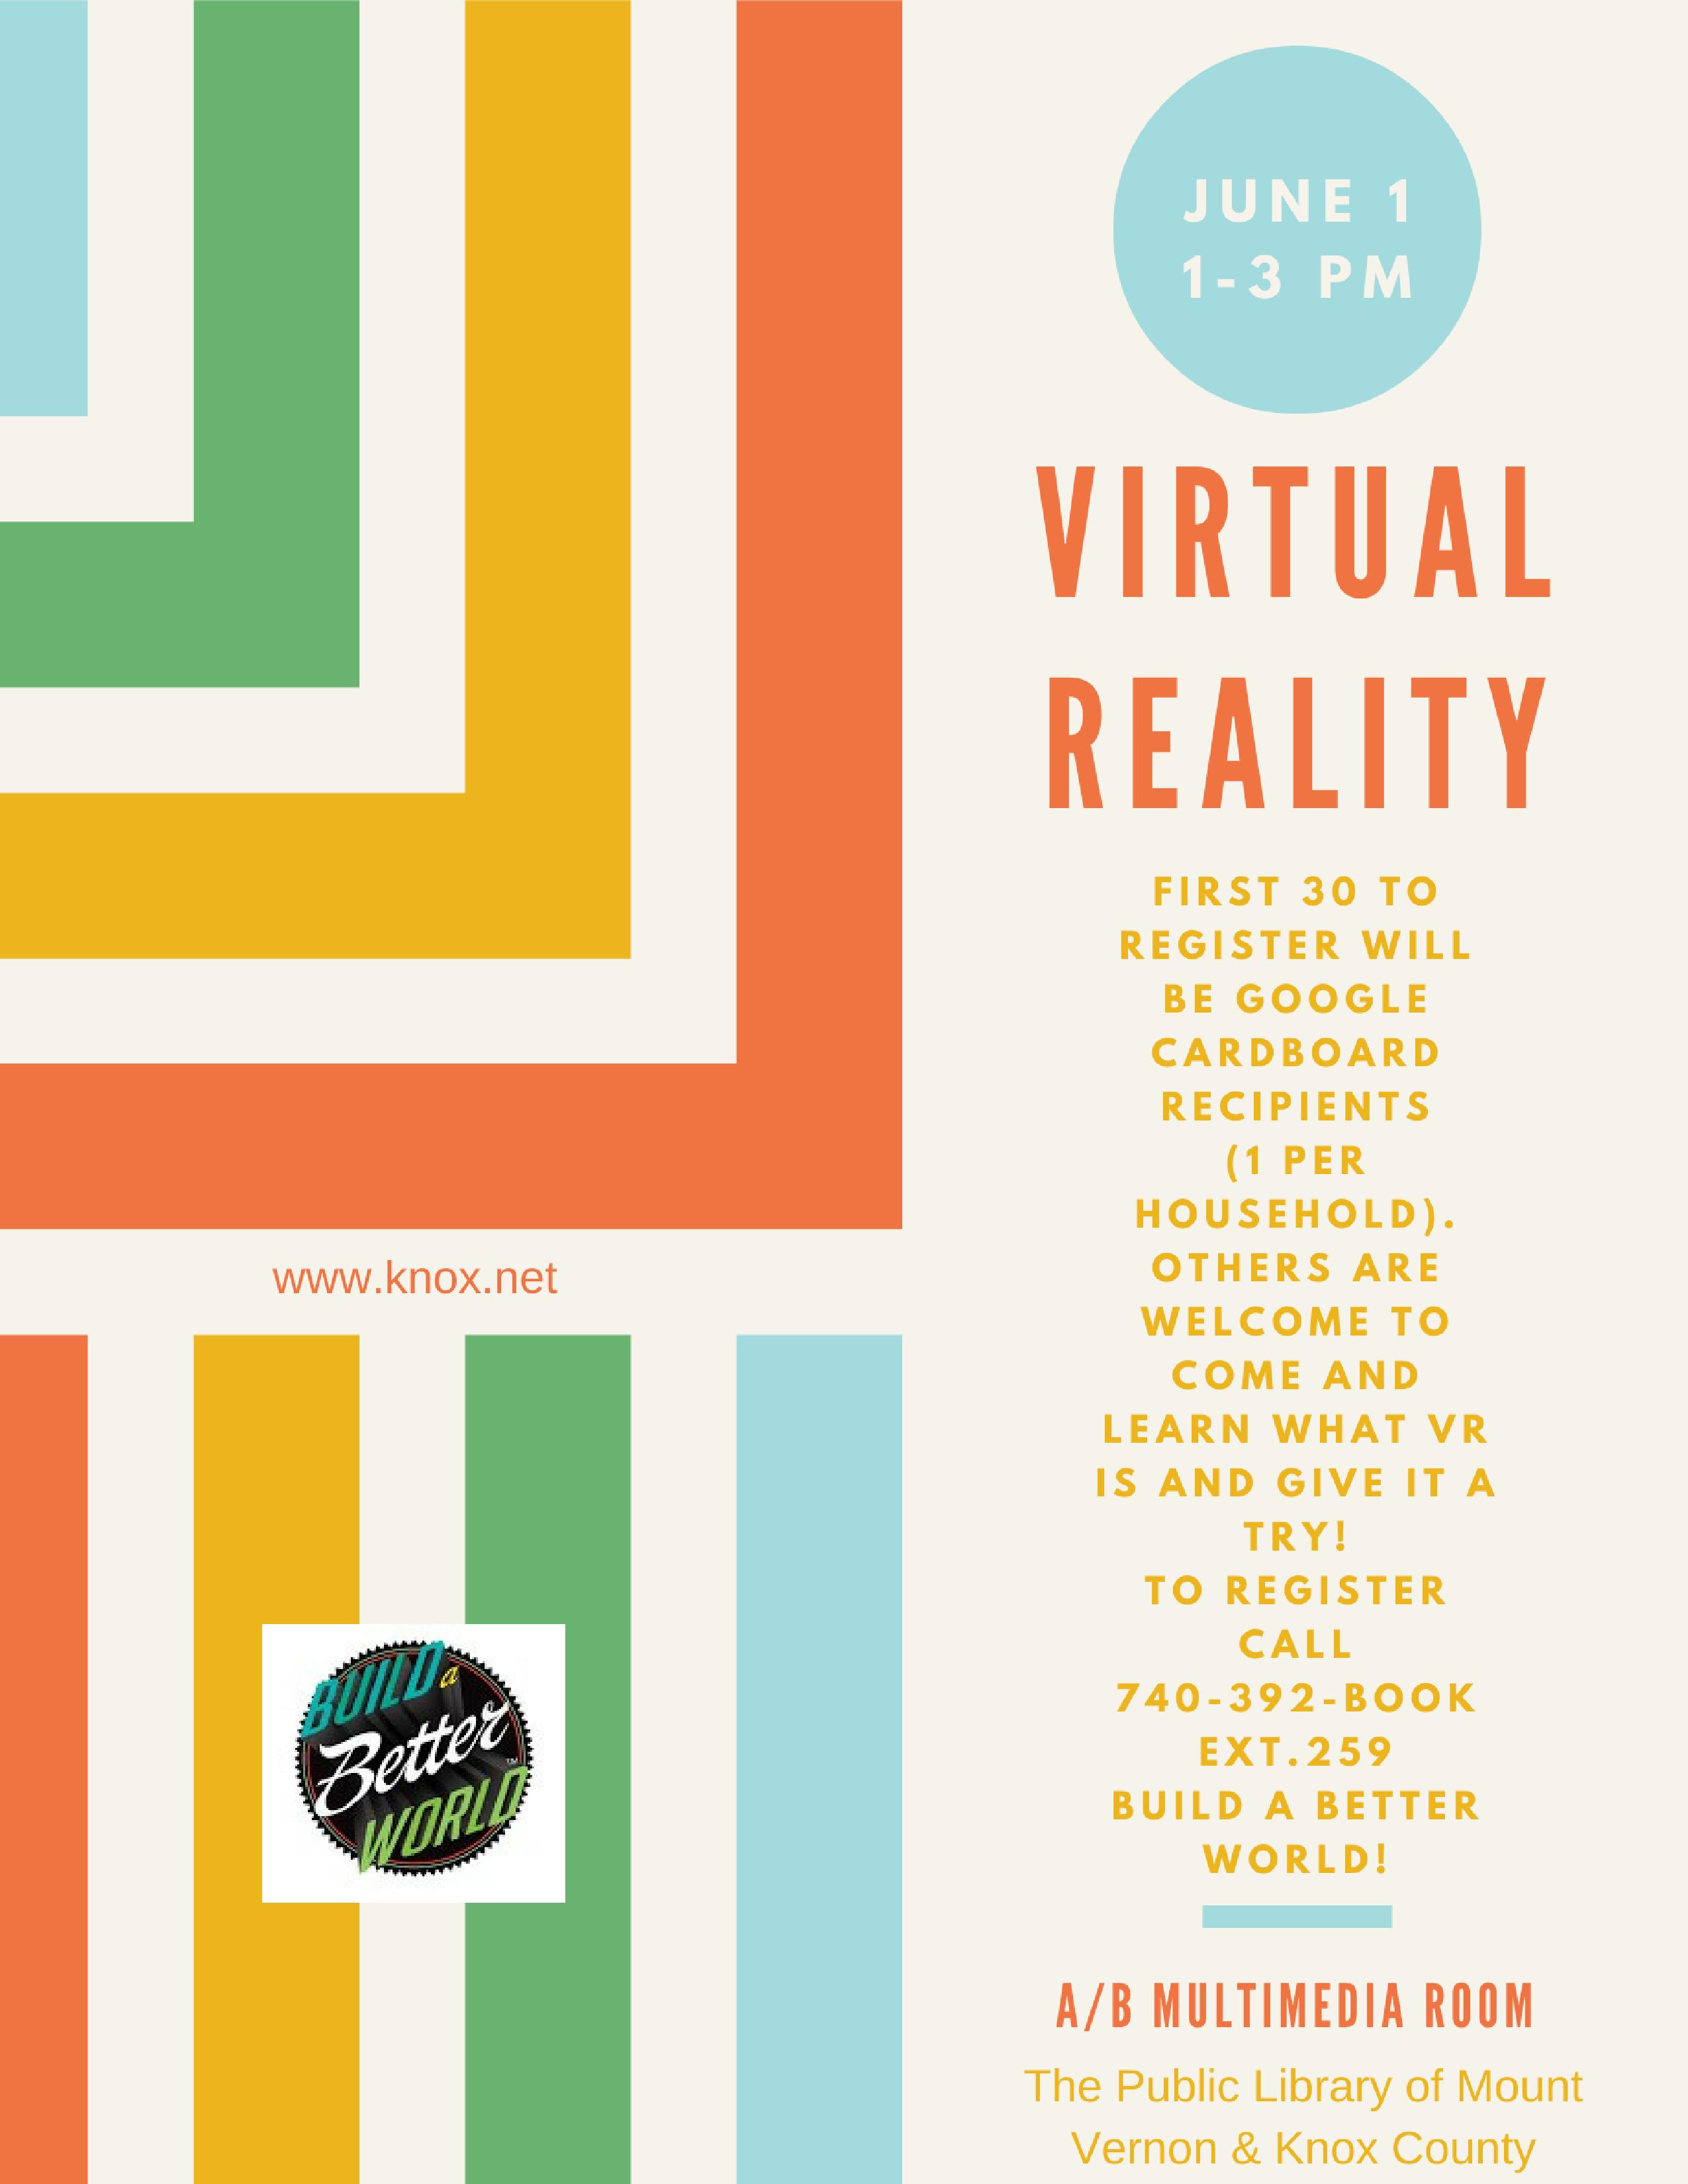 2017 Adult Summer Reading Program. Virtual Reality